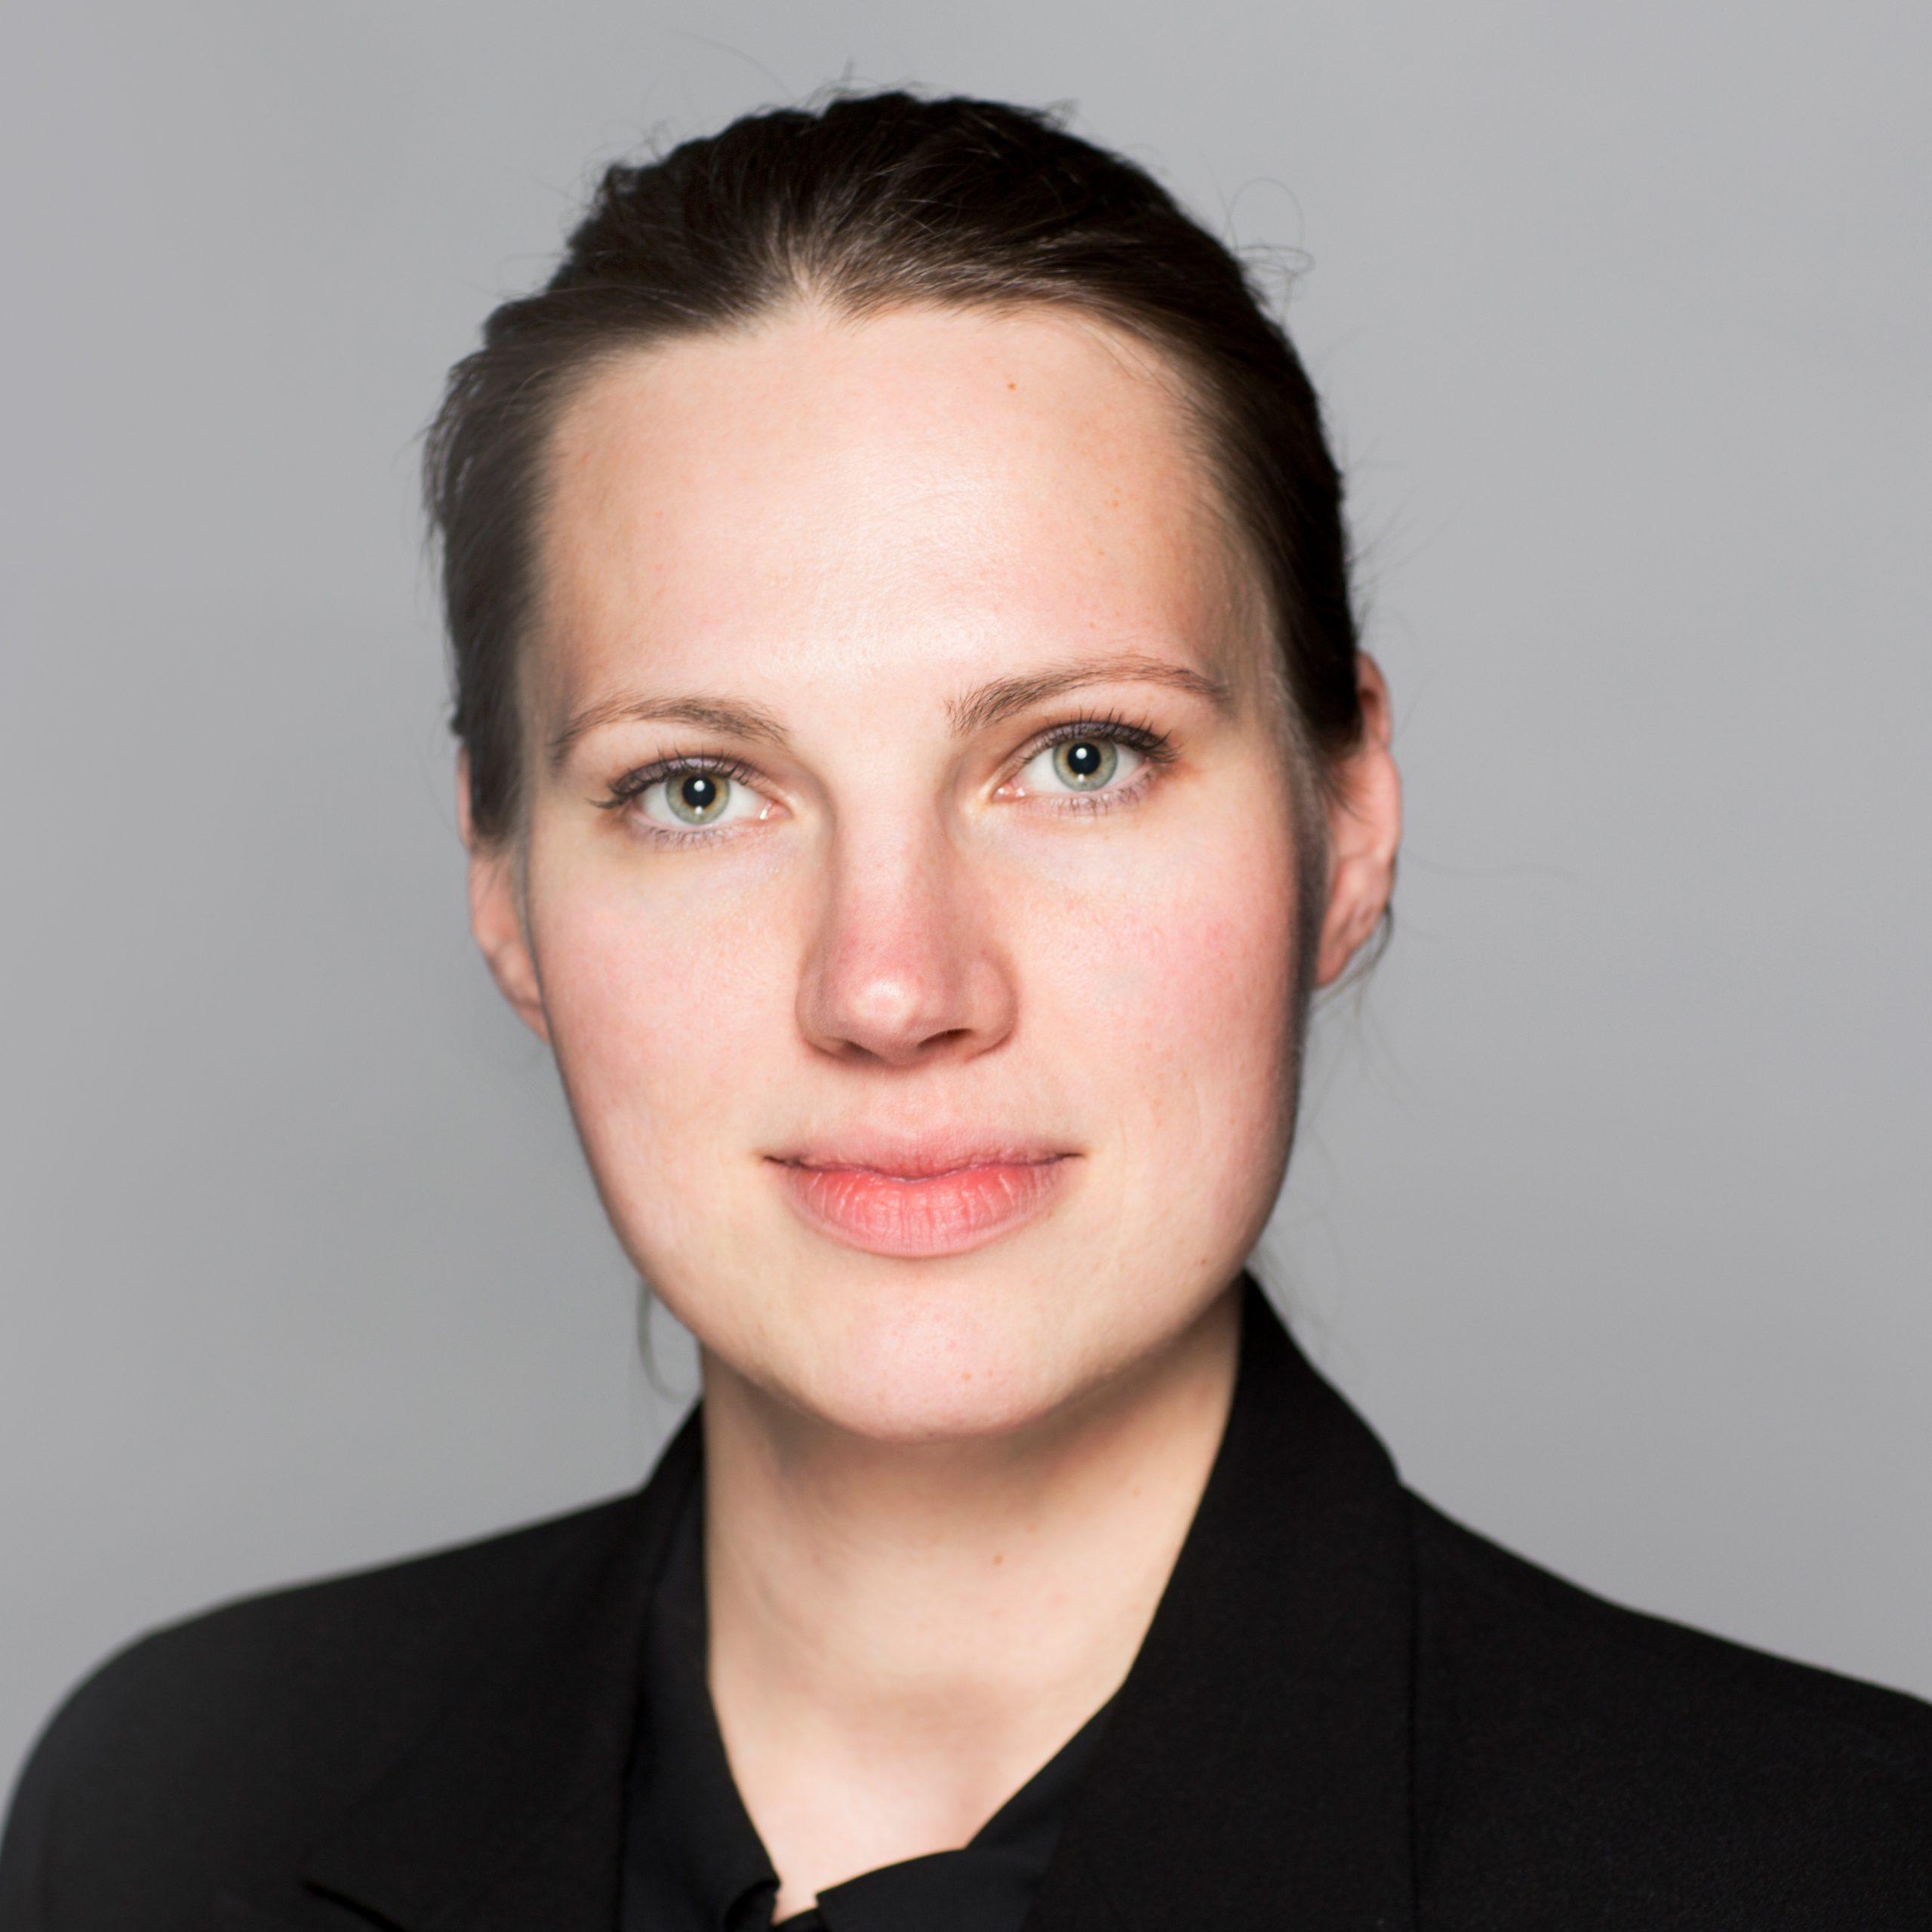 Anna Cebotareva